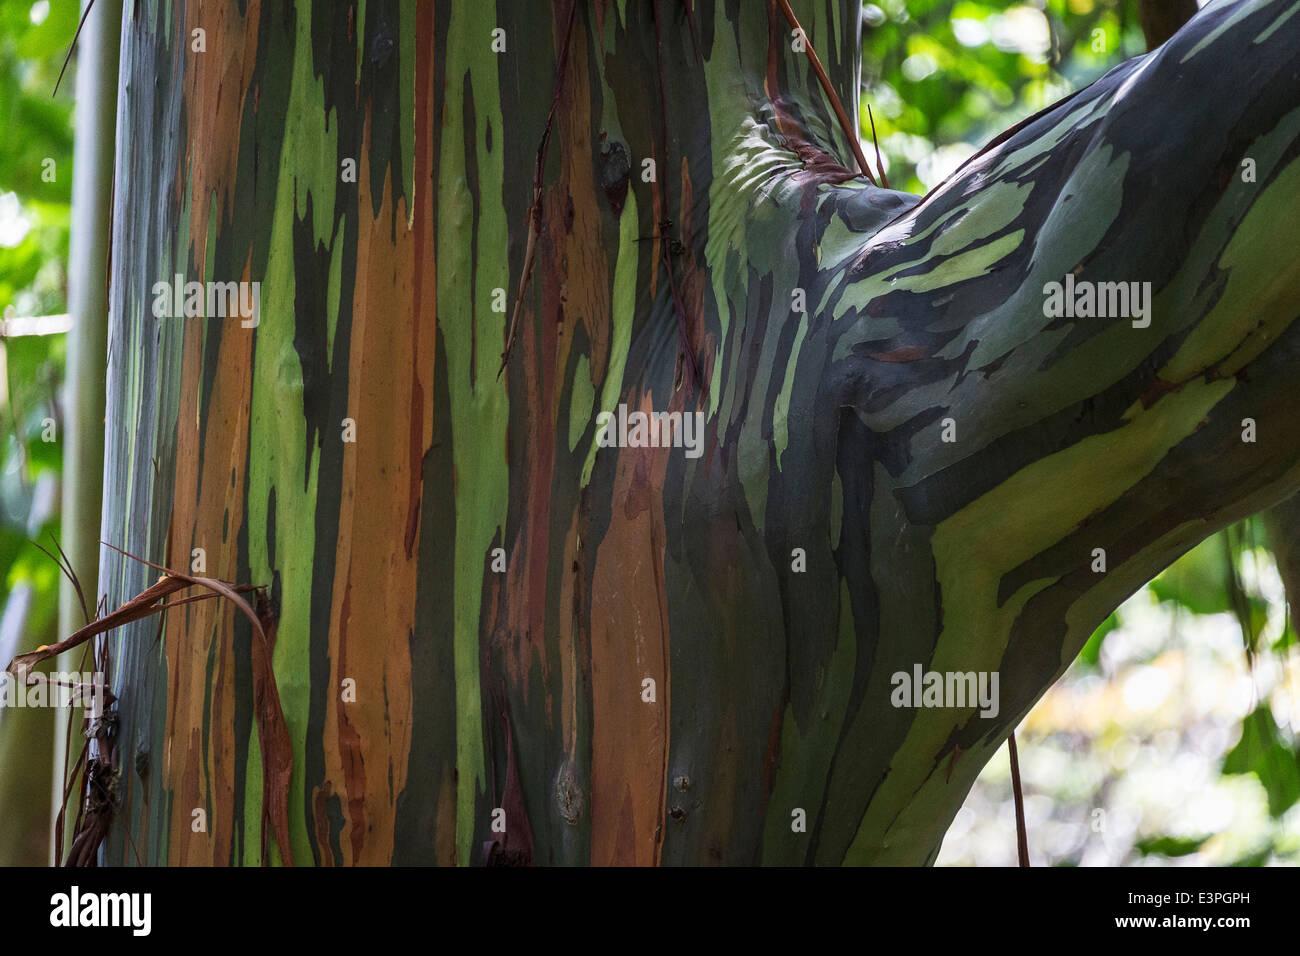 Rainbow Eucalyptus Eucalyptus deglupta) close-up multi-coloured bark New Zealand - Stock Image